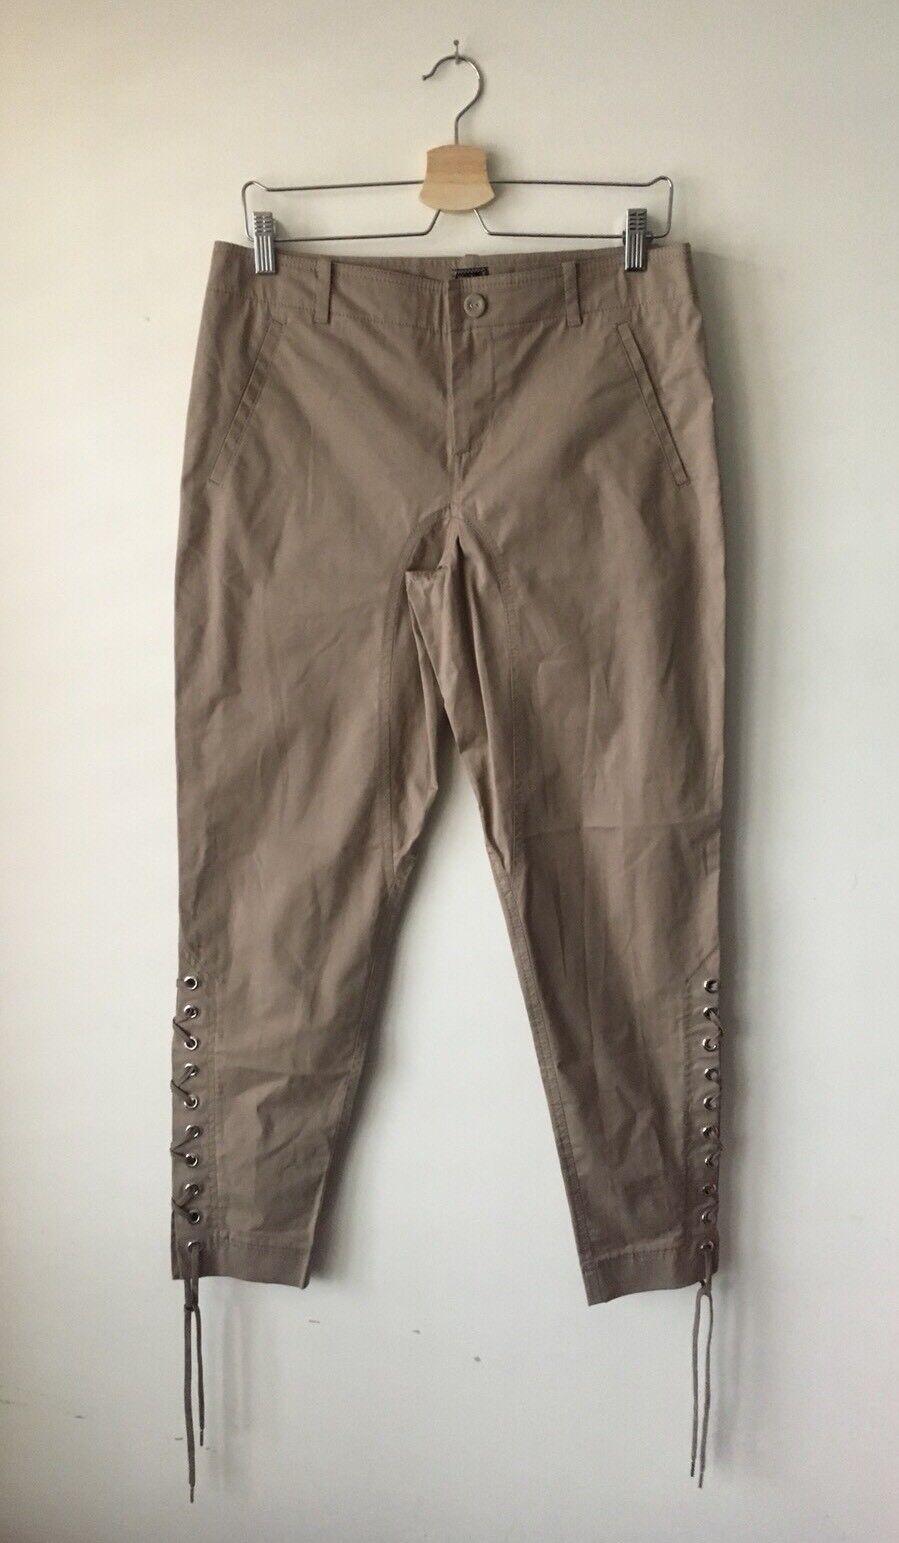 Jean Paul Gaultier Laced Trousers Size